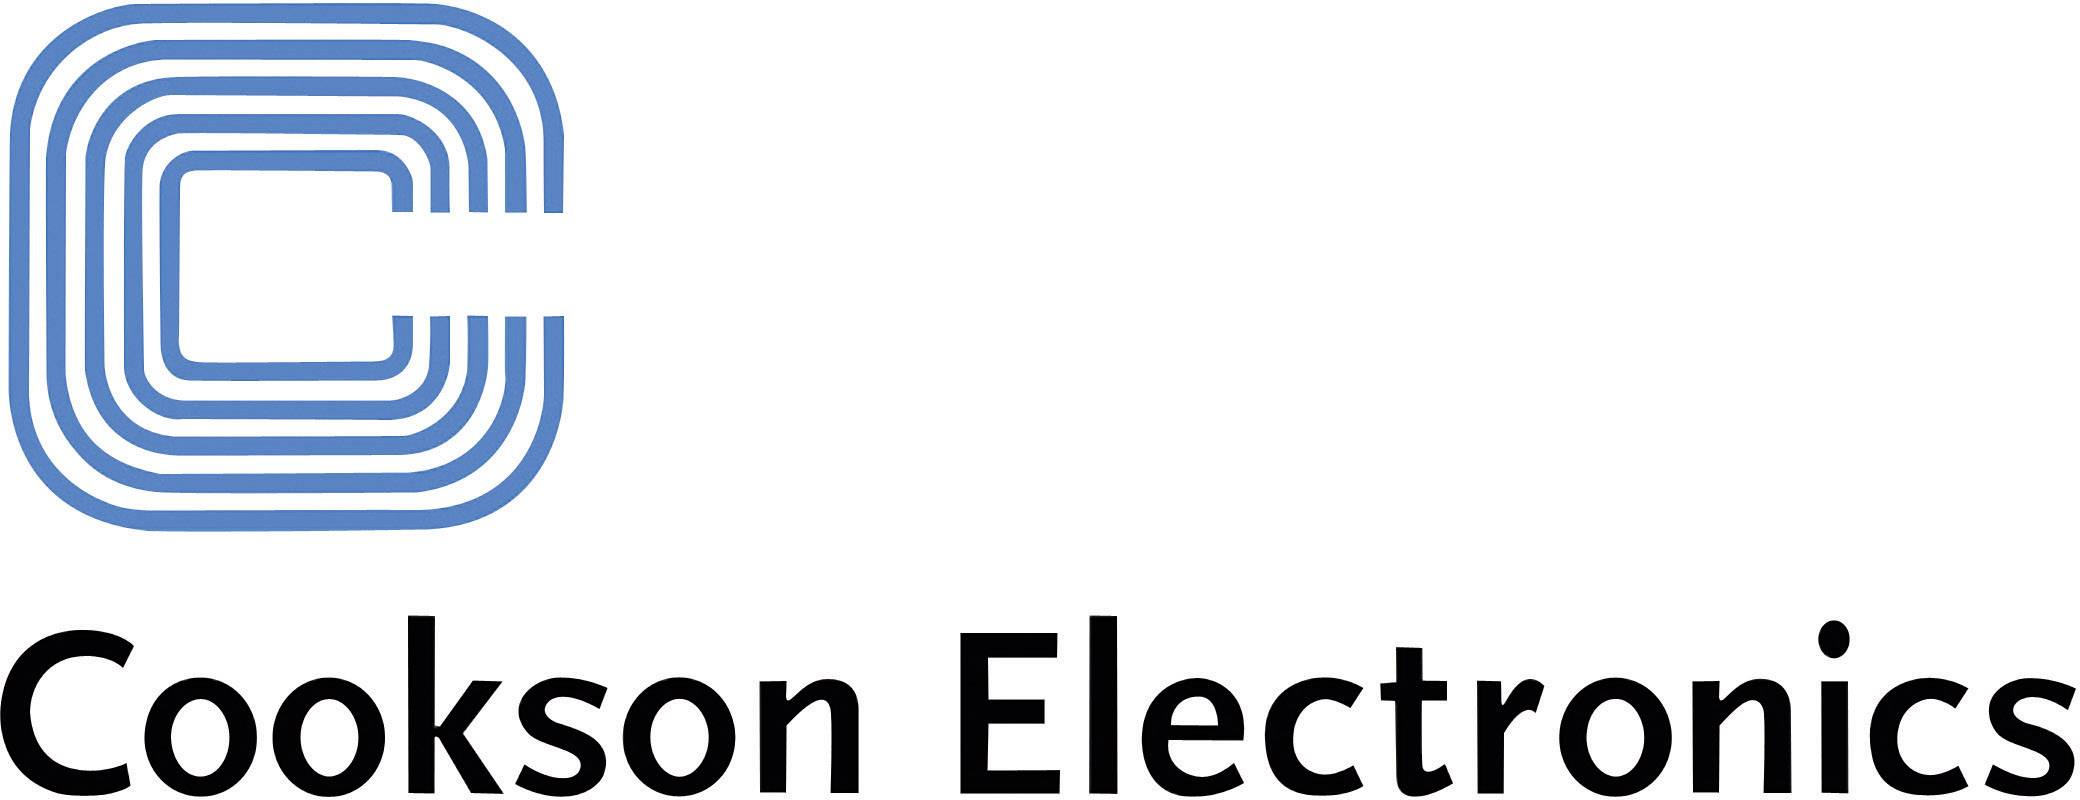 Cookson Electro